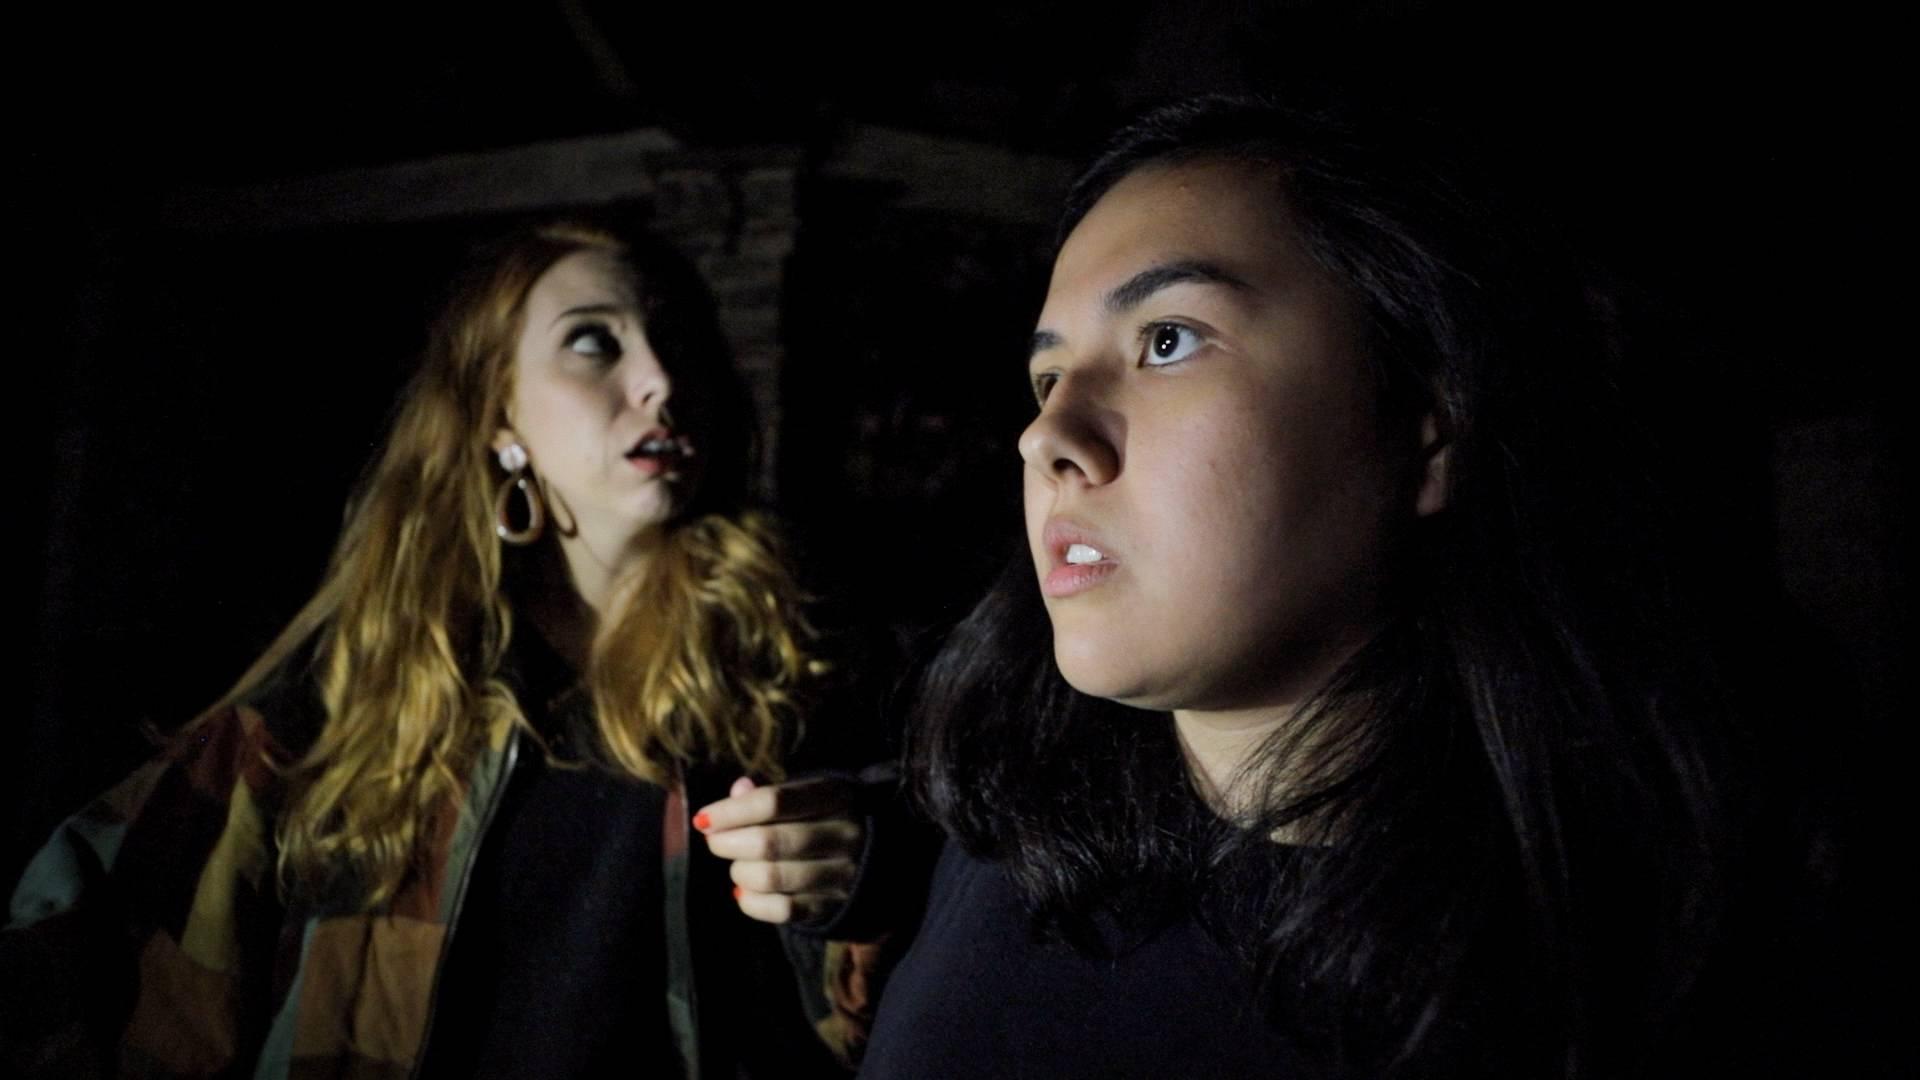 I Trapped My Friend In A Horror Film